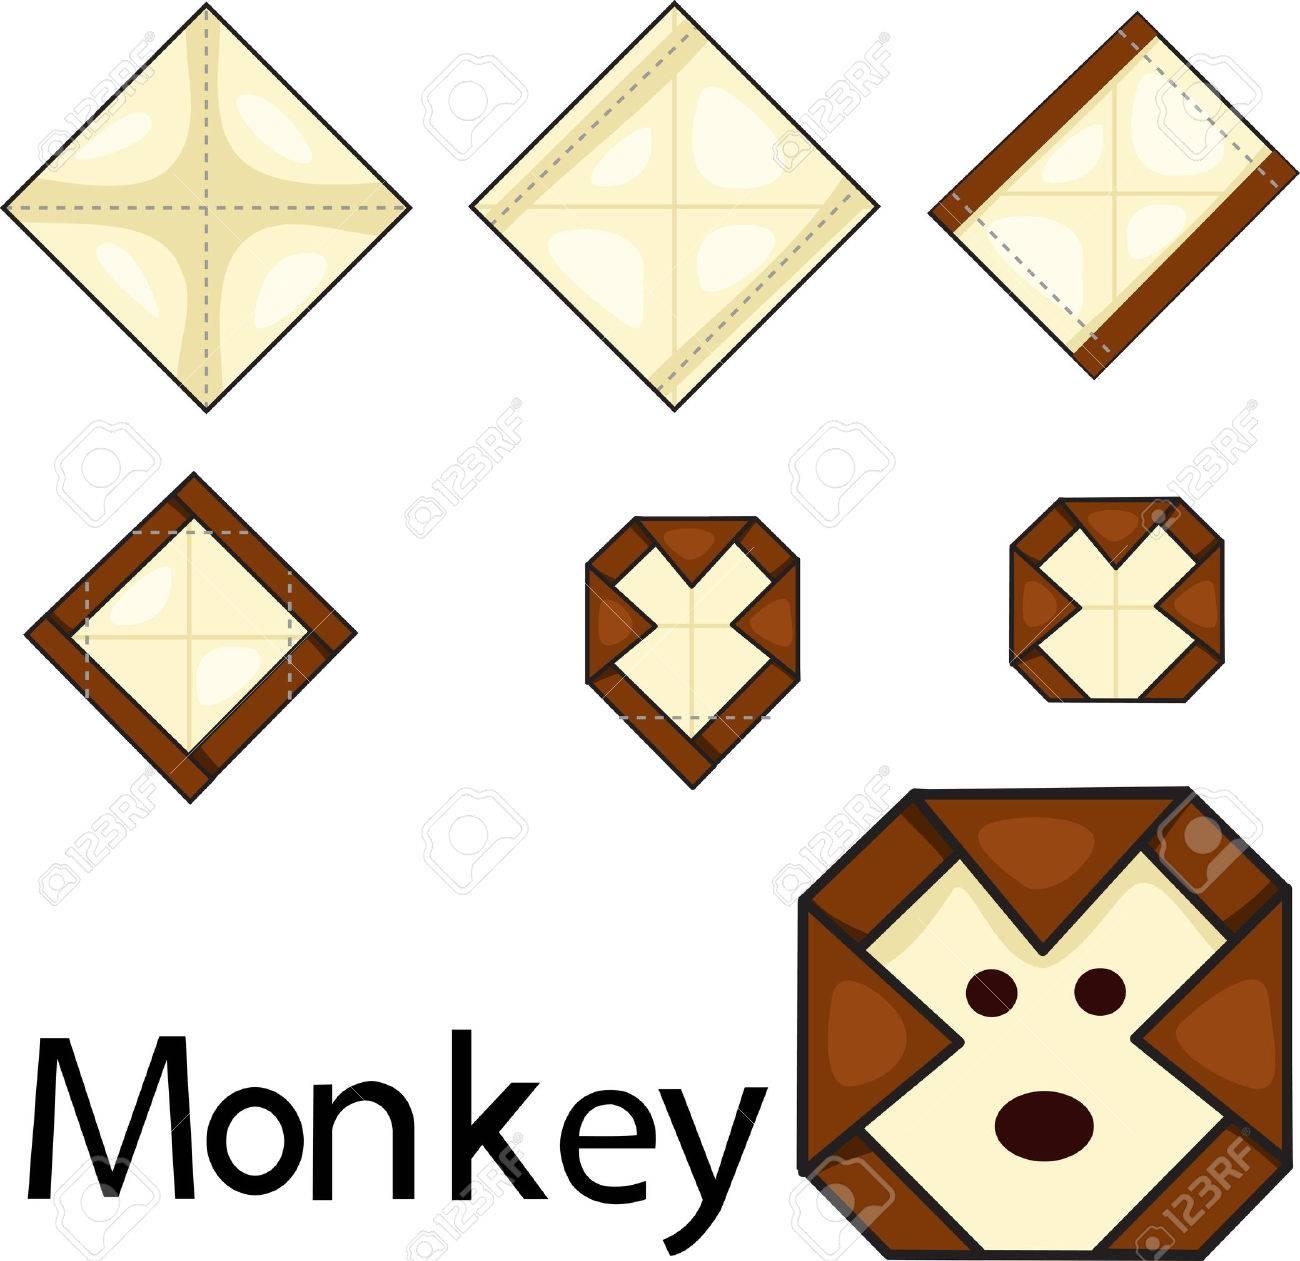 Illustrator Of Origami Monkey Face Stock Vector